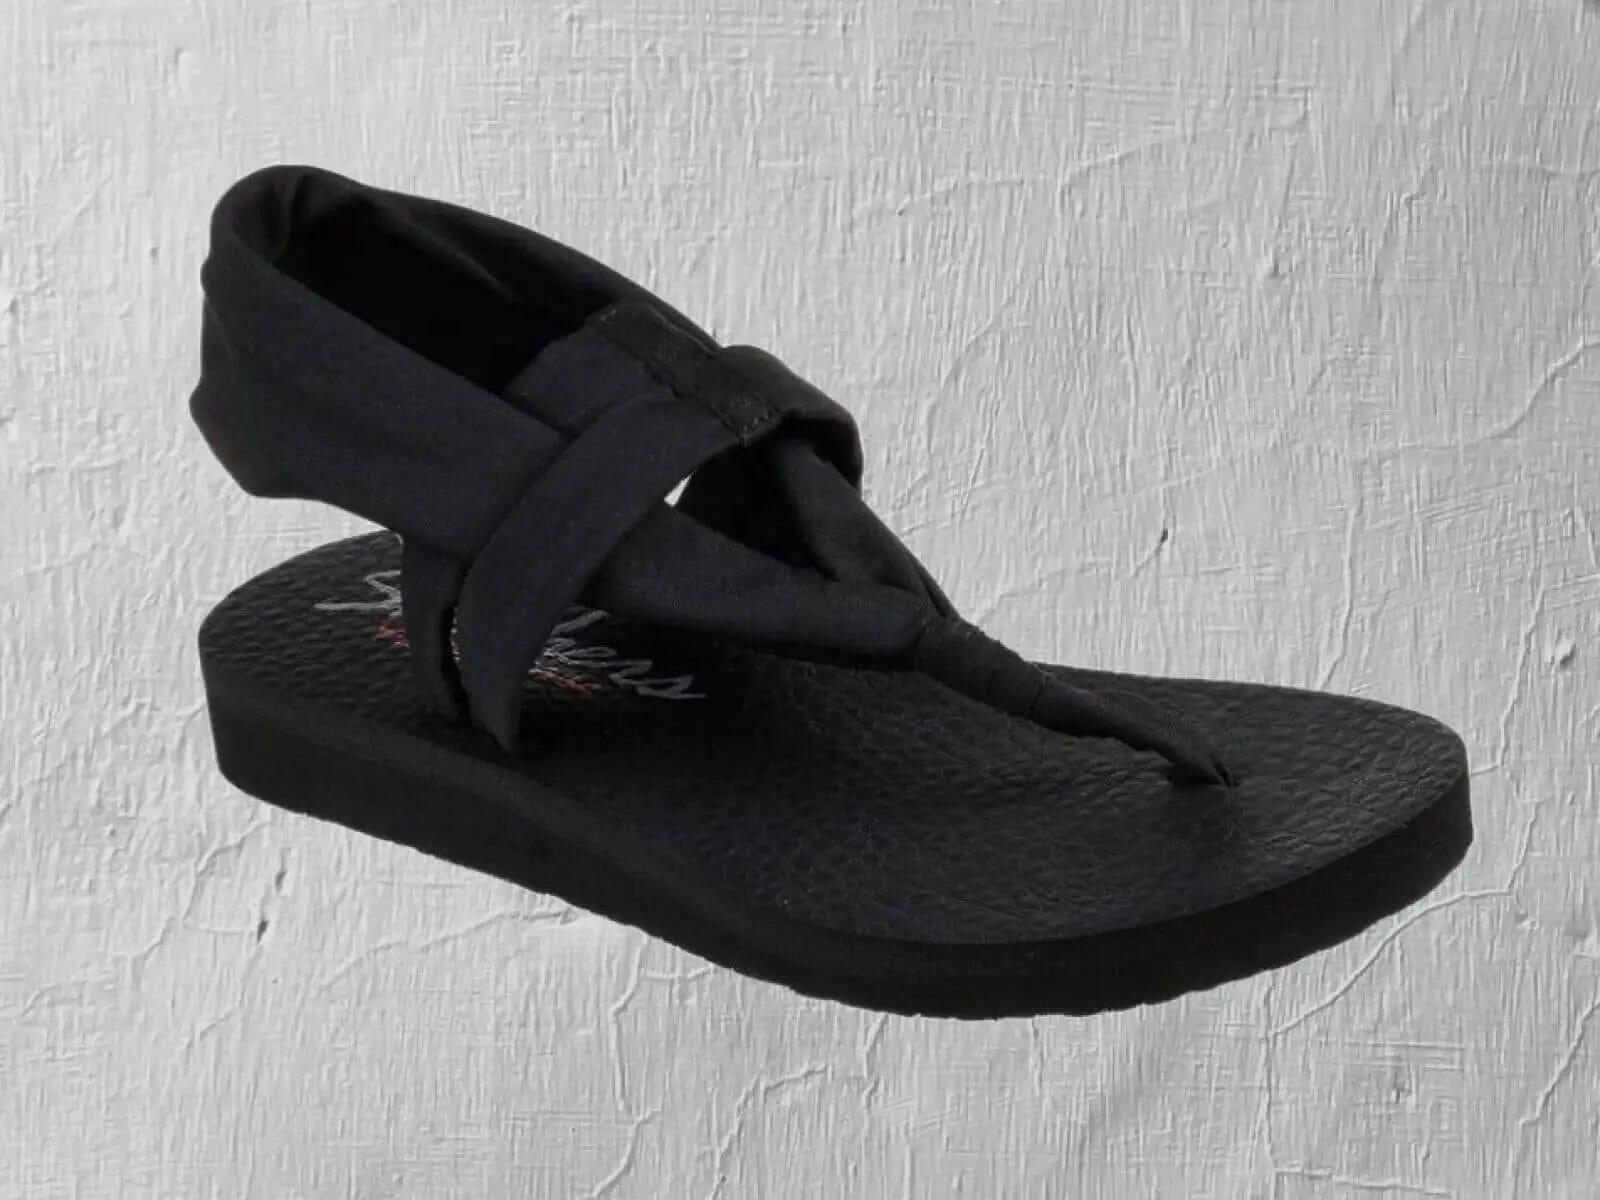 Skechers meditation studio kicks black sandal with foam cushioned sole.